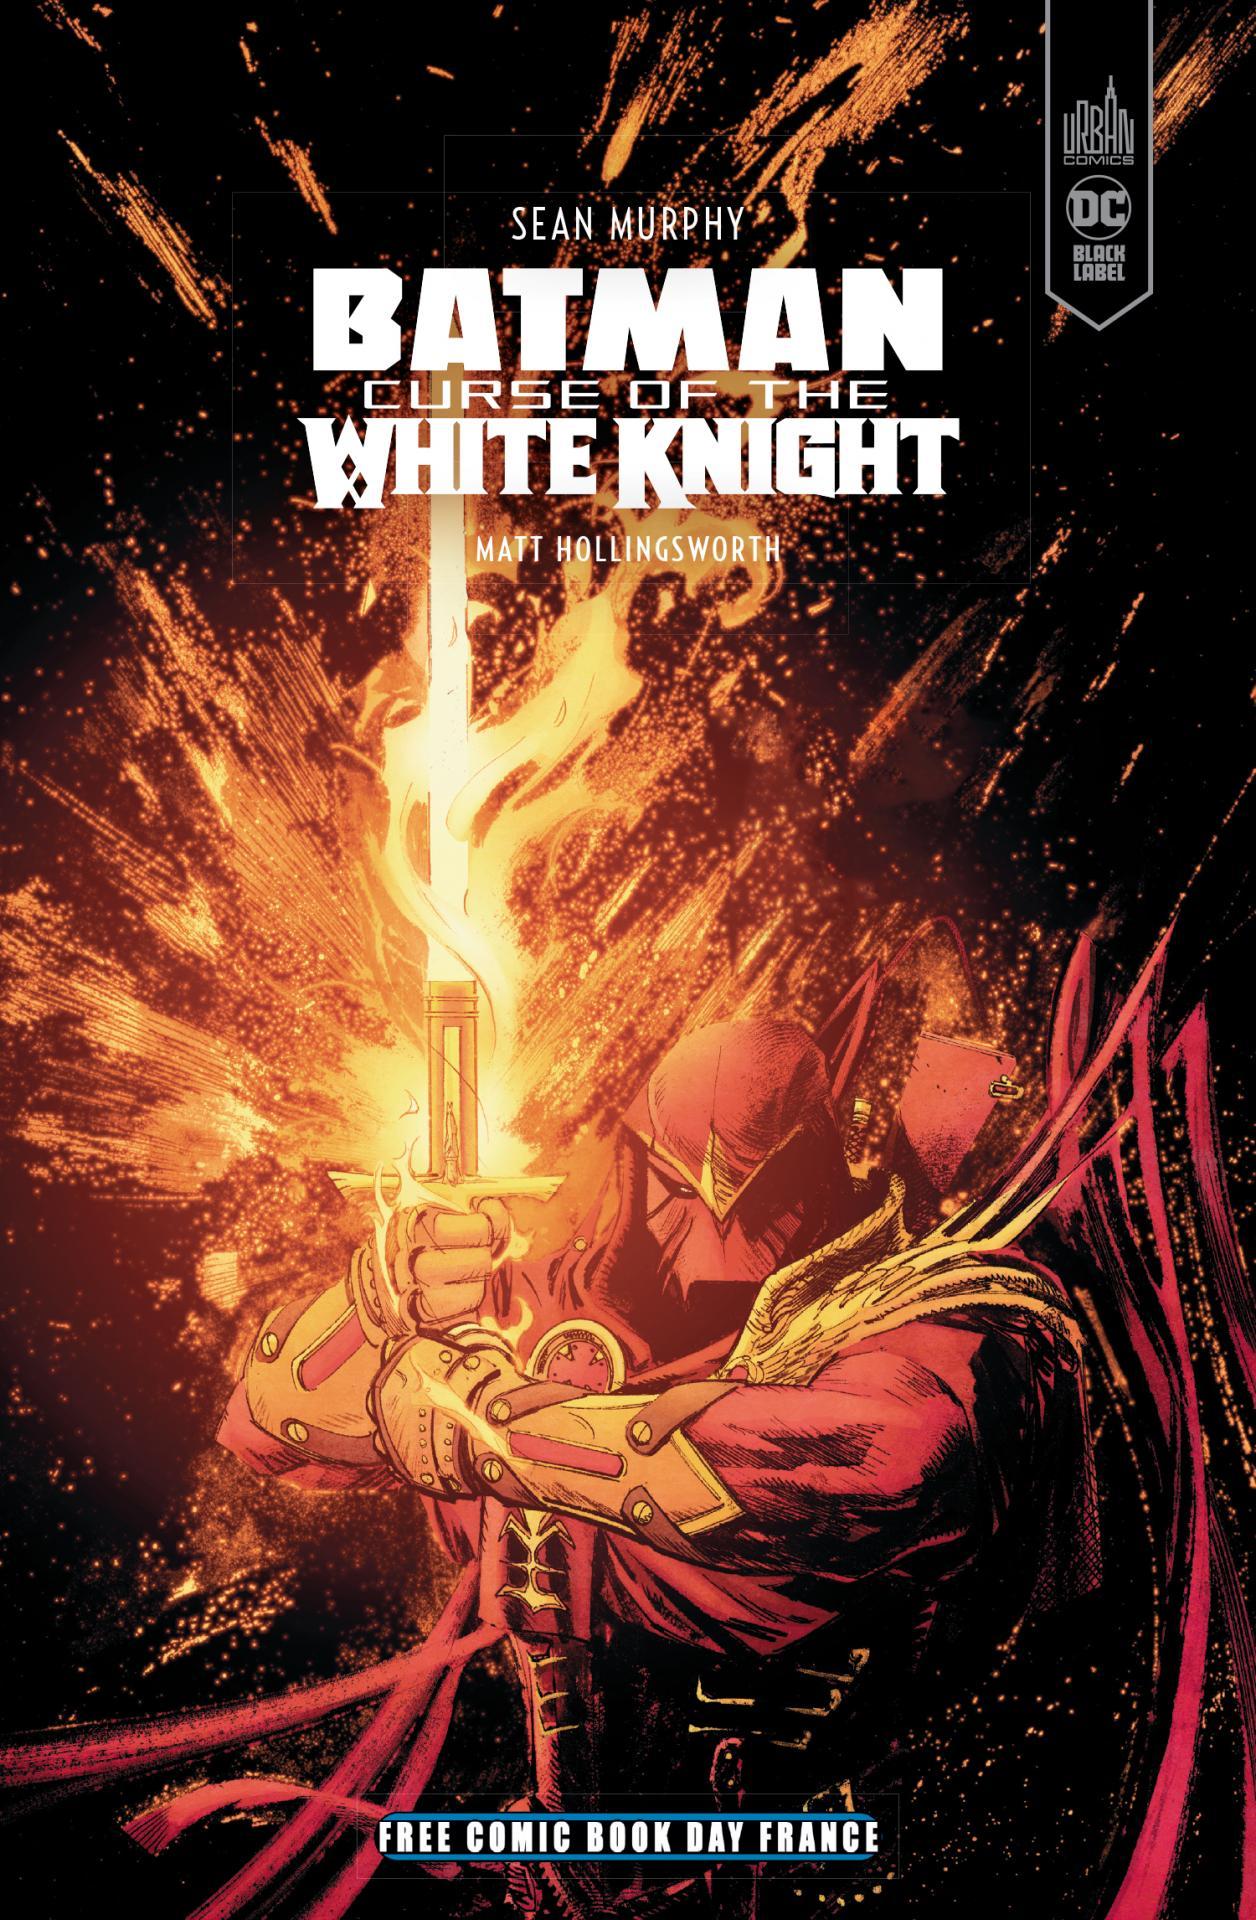 Urban comics fcbd 2020 batman curse of the white knight